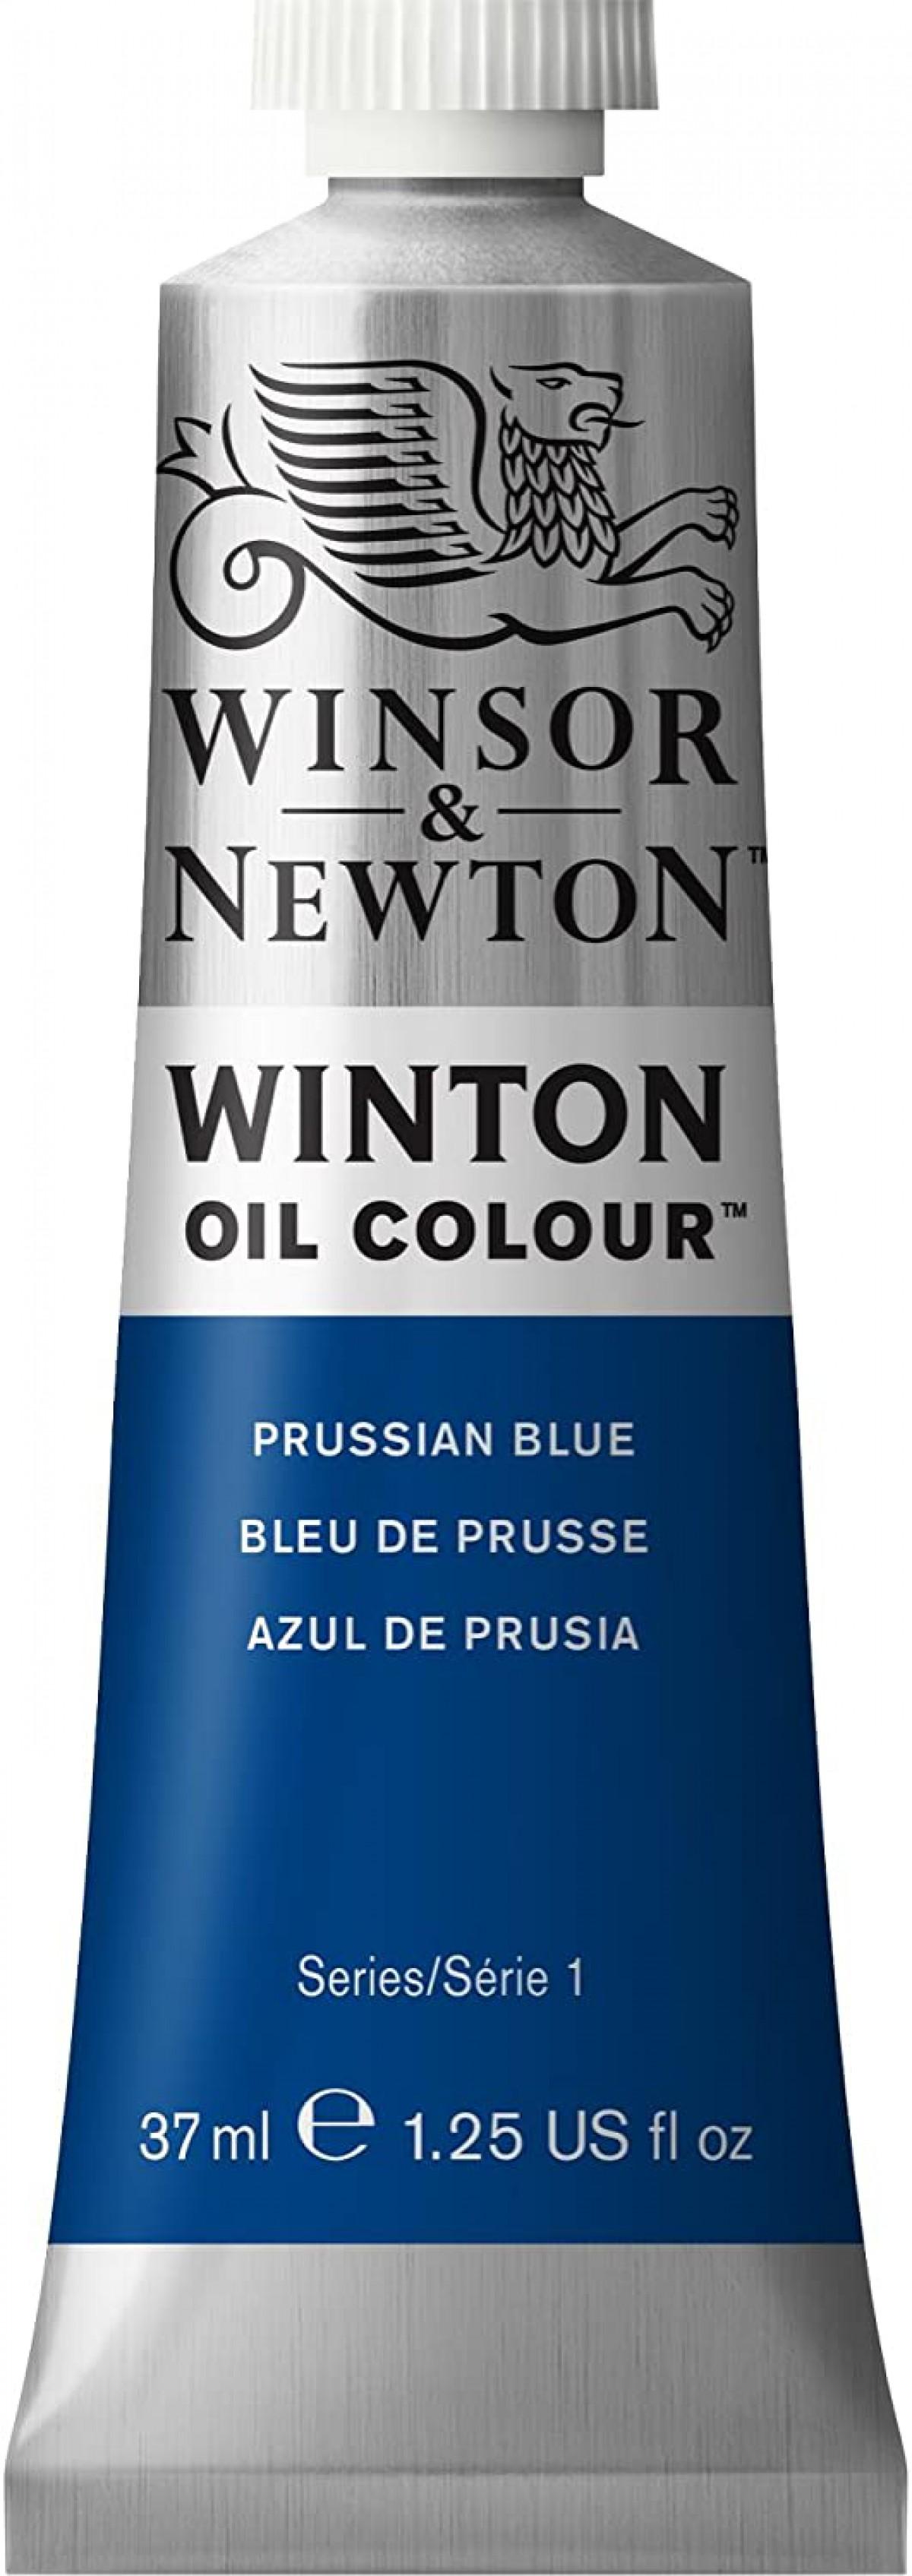 Winsor Newton Winton Yağlı Boya 37ml - Prussian Blue 538